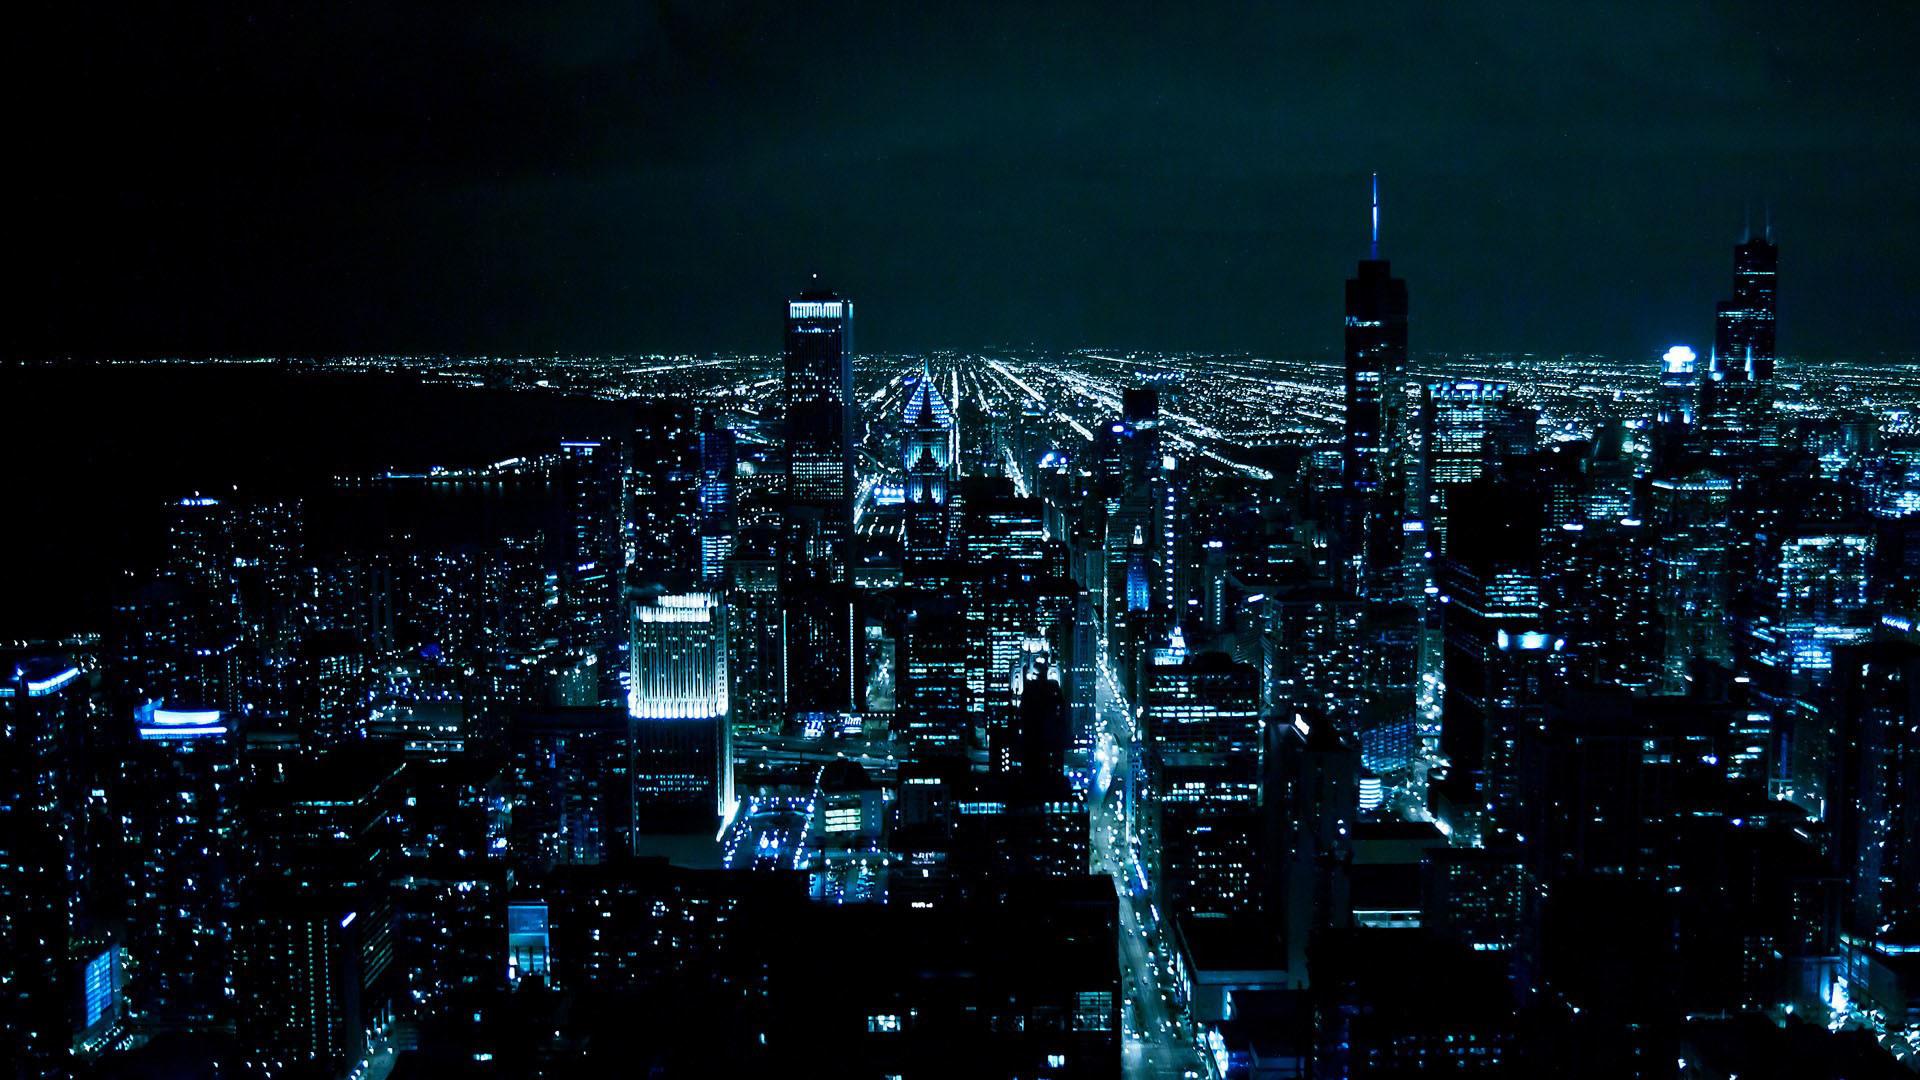 Gotham City at Night wallpaper